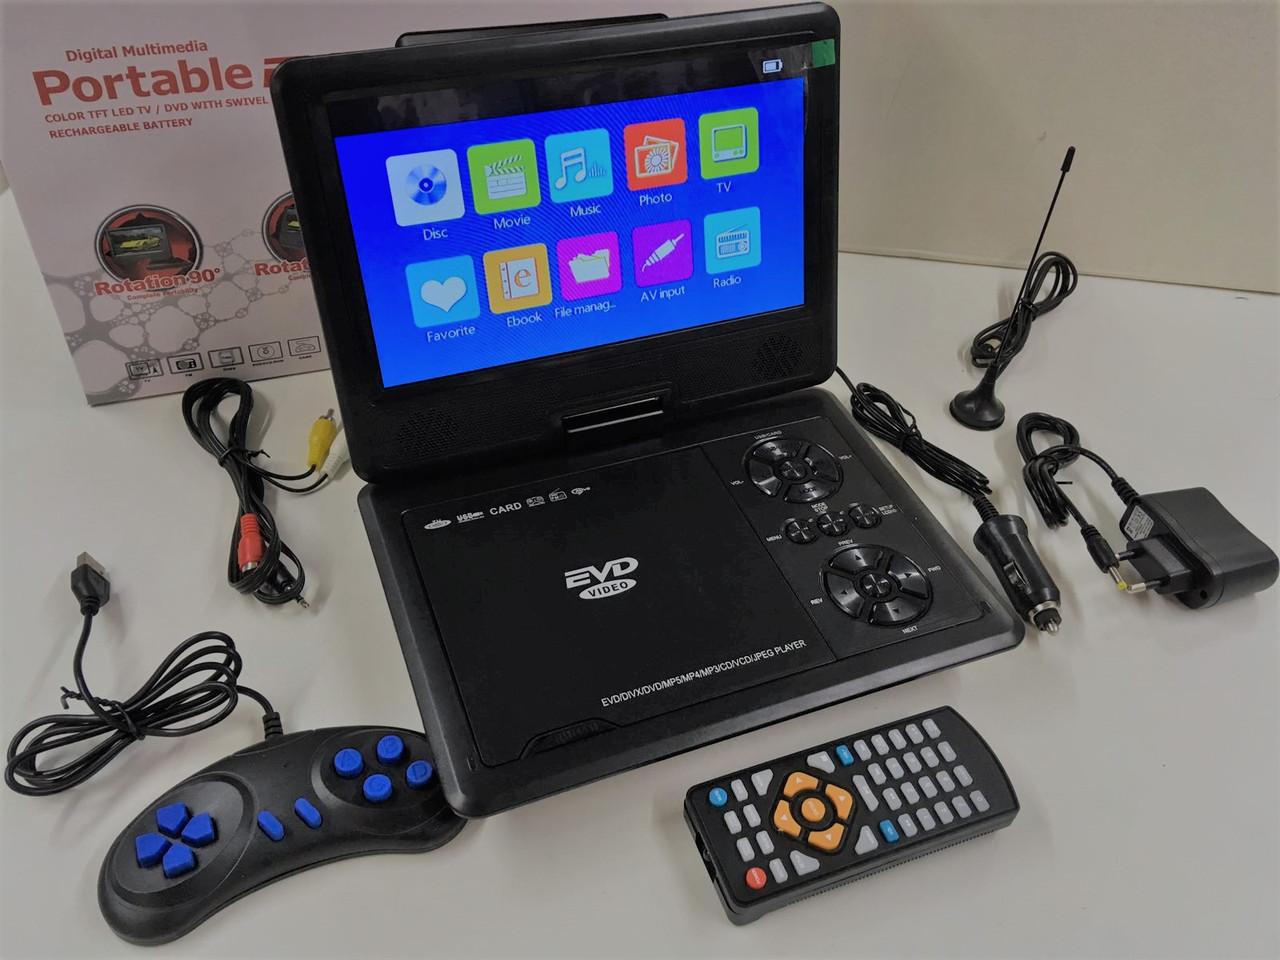 Портативный телевизор NS958H с DVD 9.8 дюйма